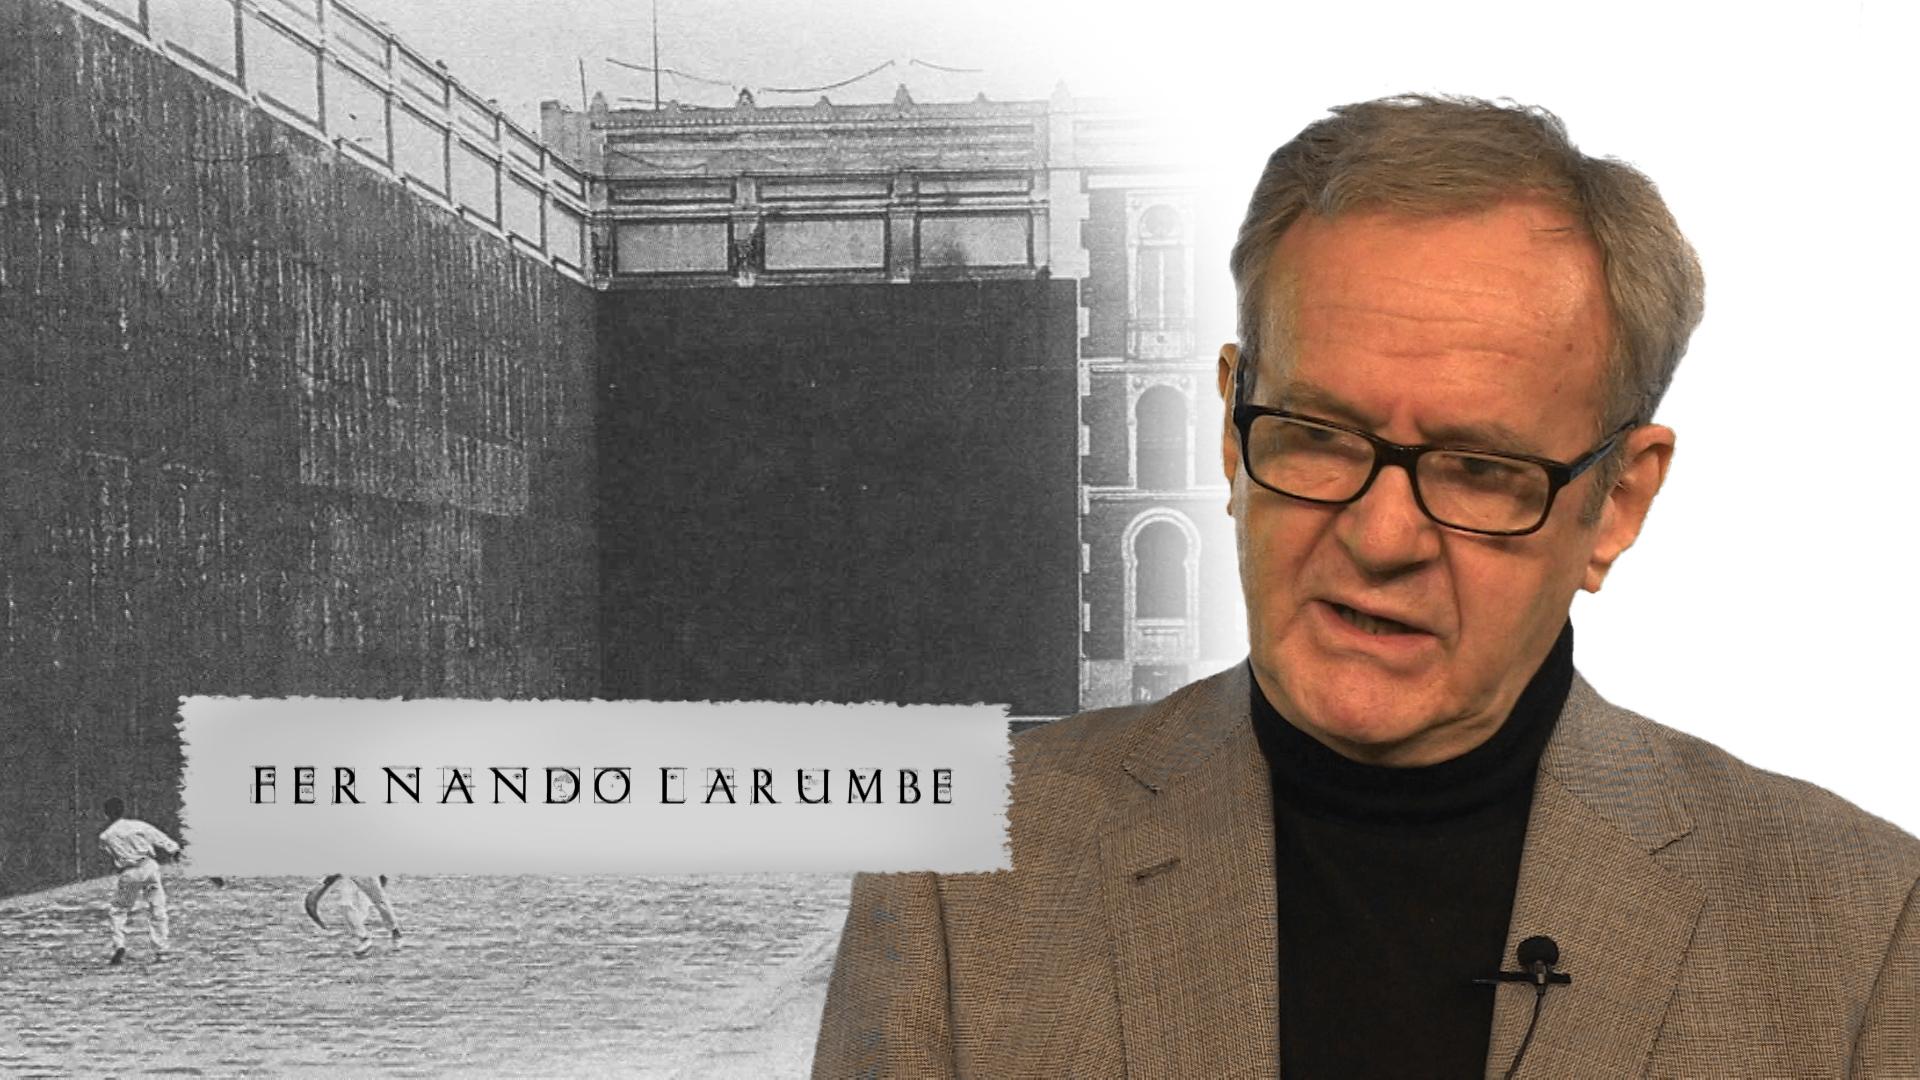 Fernando Larumbe